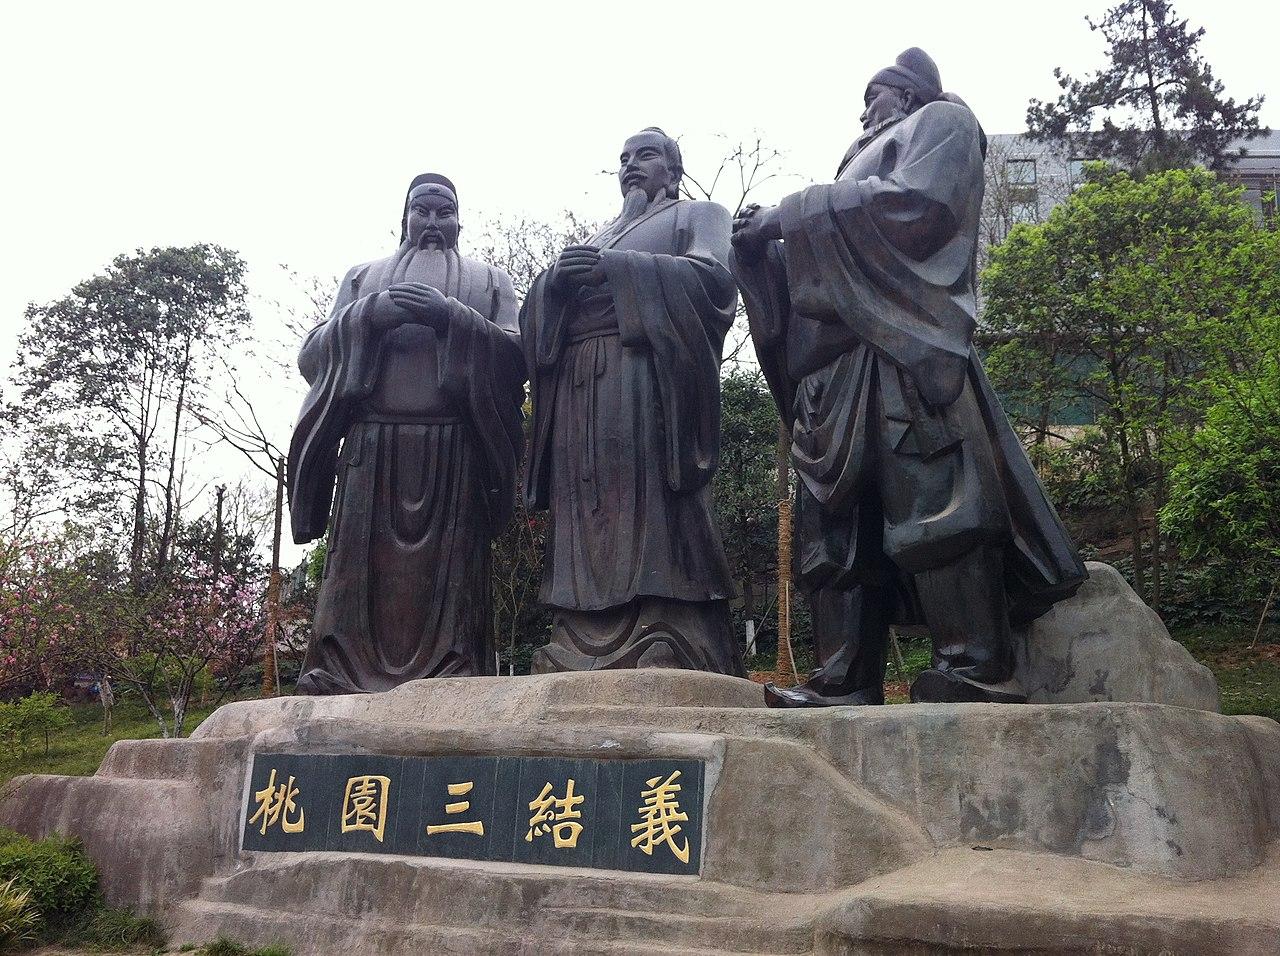 File:桃園三結義 - panoramio.jpg - Wikimedia Commons